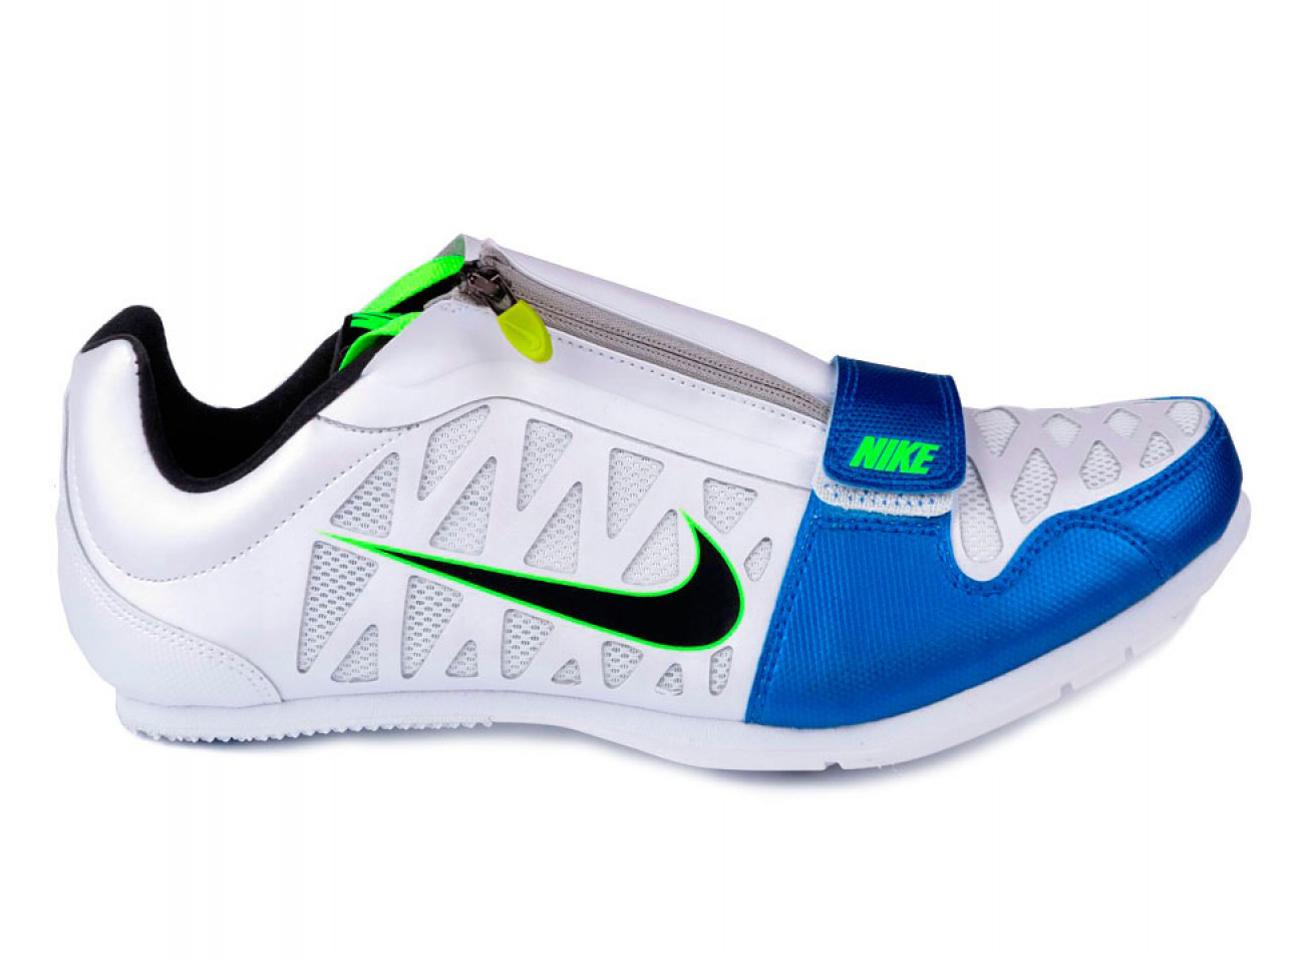 Nike Zoom Long Jump Шиповки для прыжков в длину white